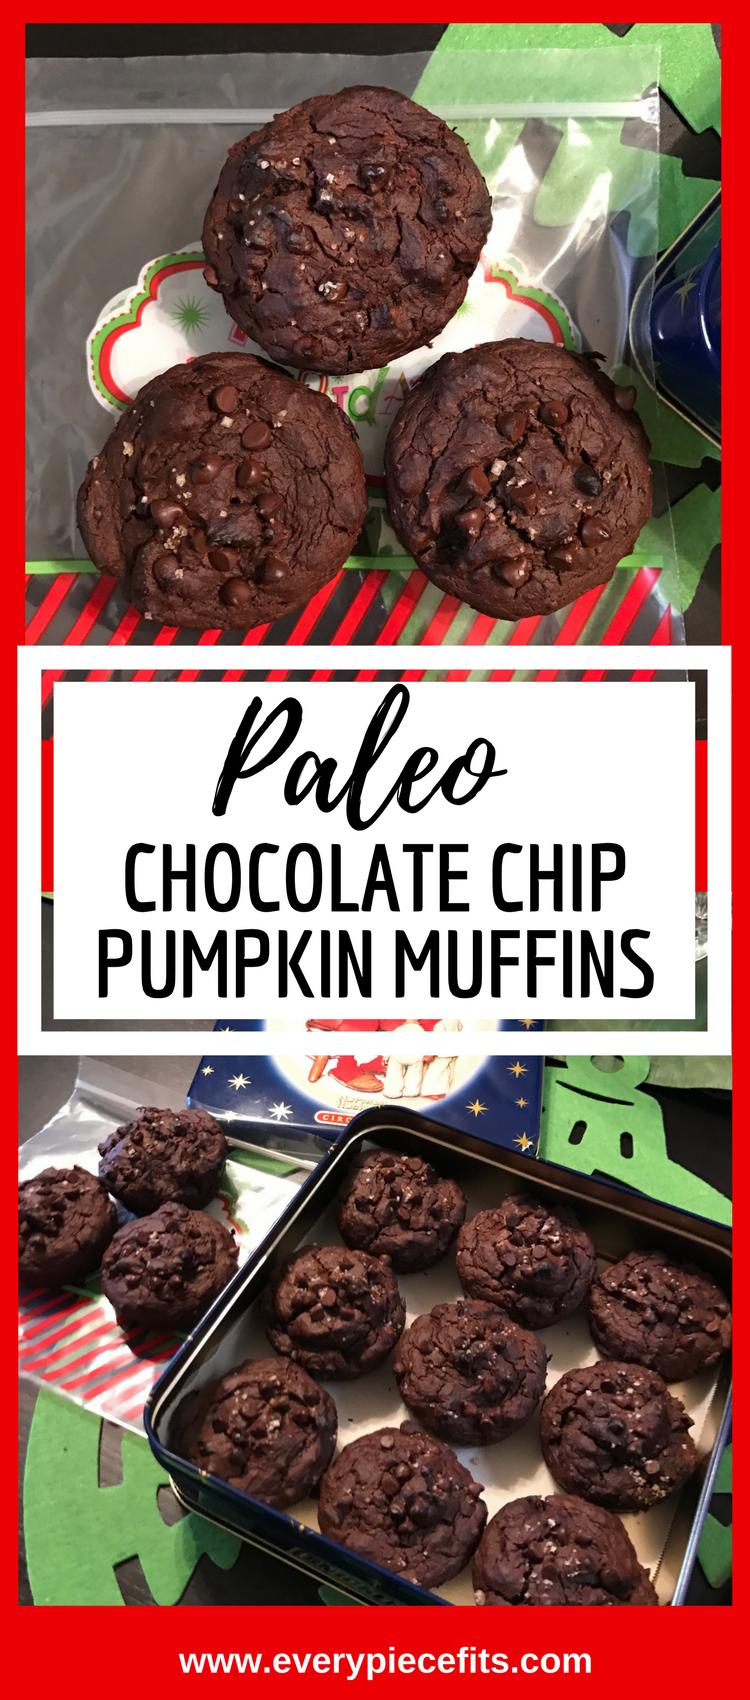 Paleo Chocolate Chip Pumpkin Muffins.png